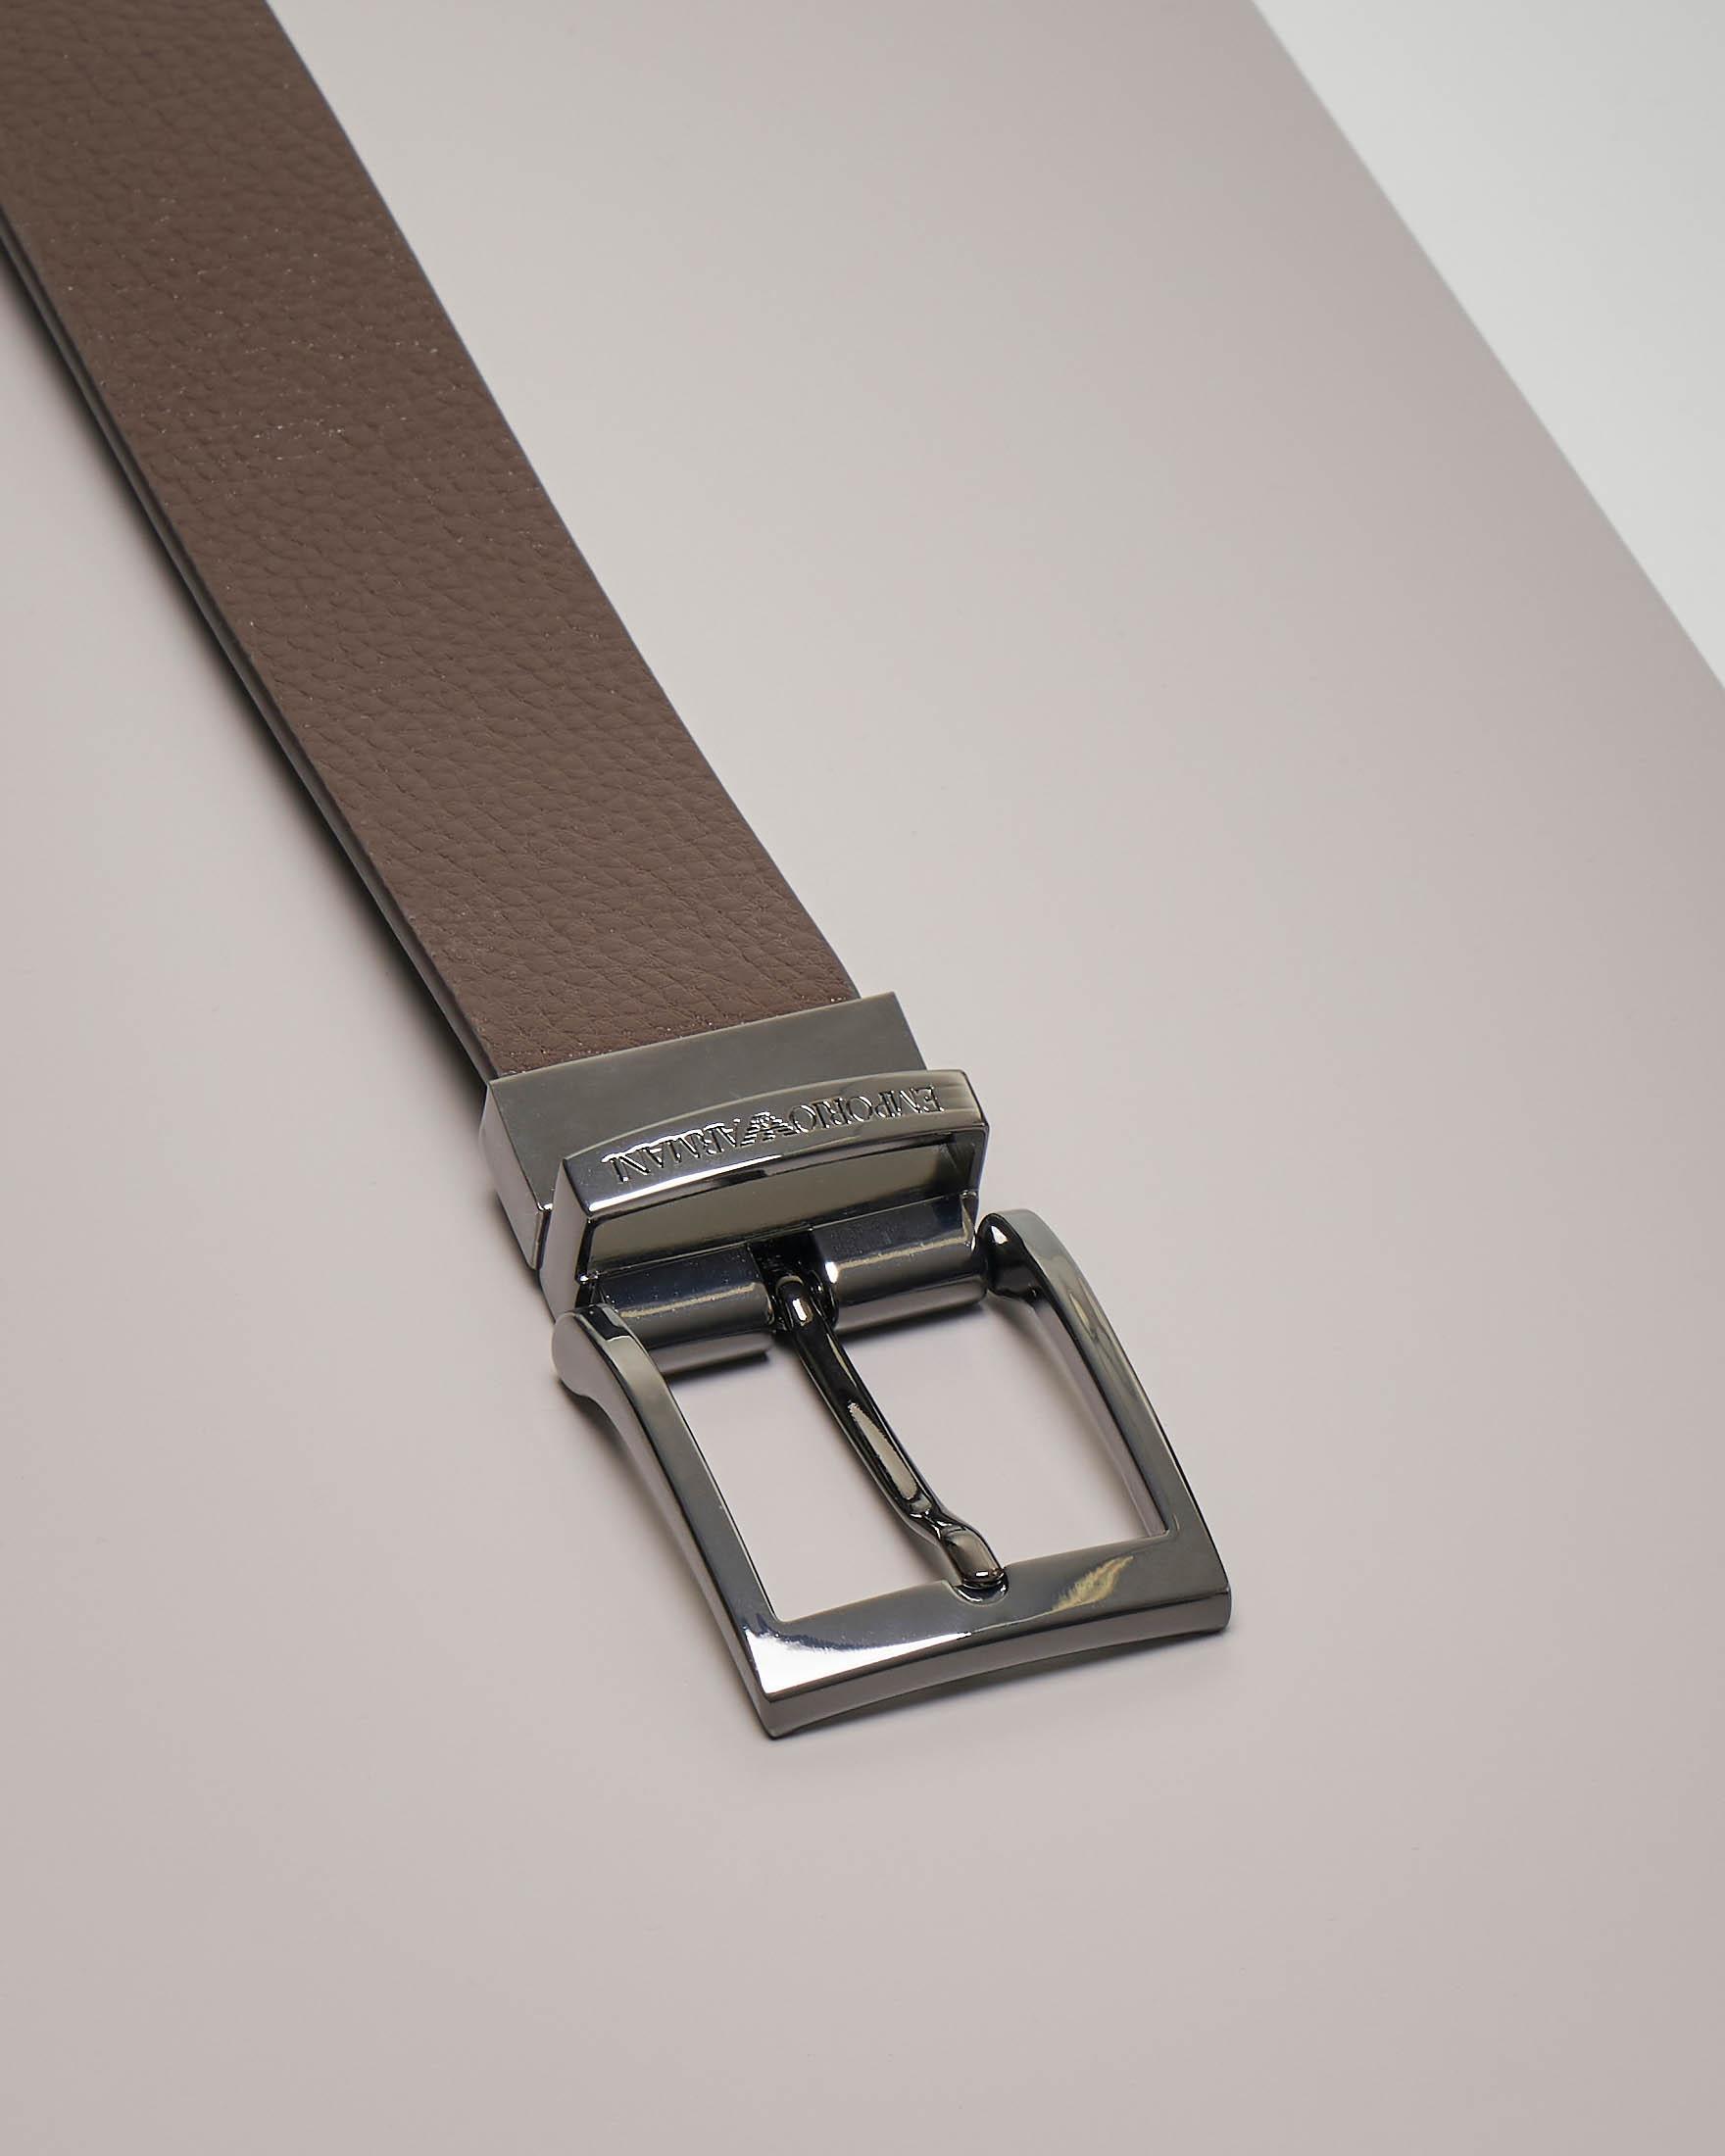 Cintura marrone in pelle martellata reversibile in pelle liscia